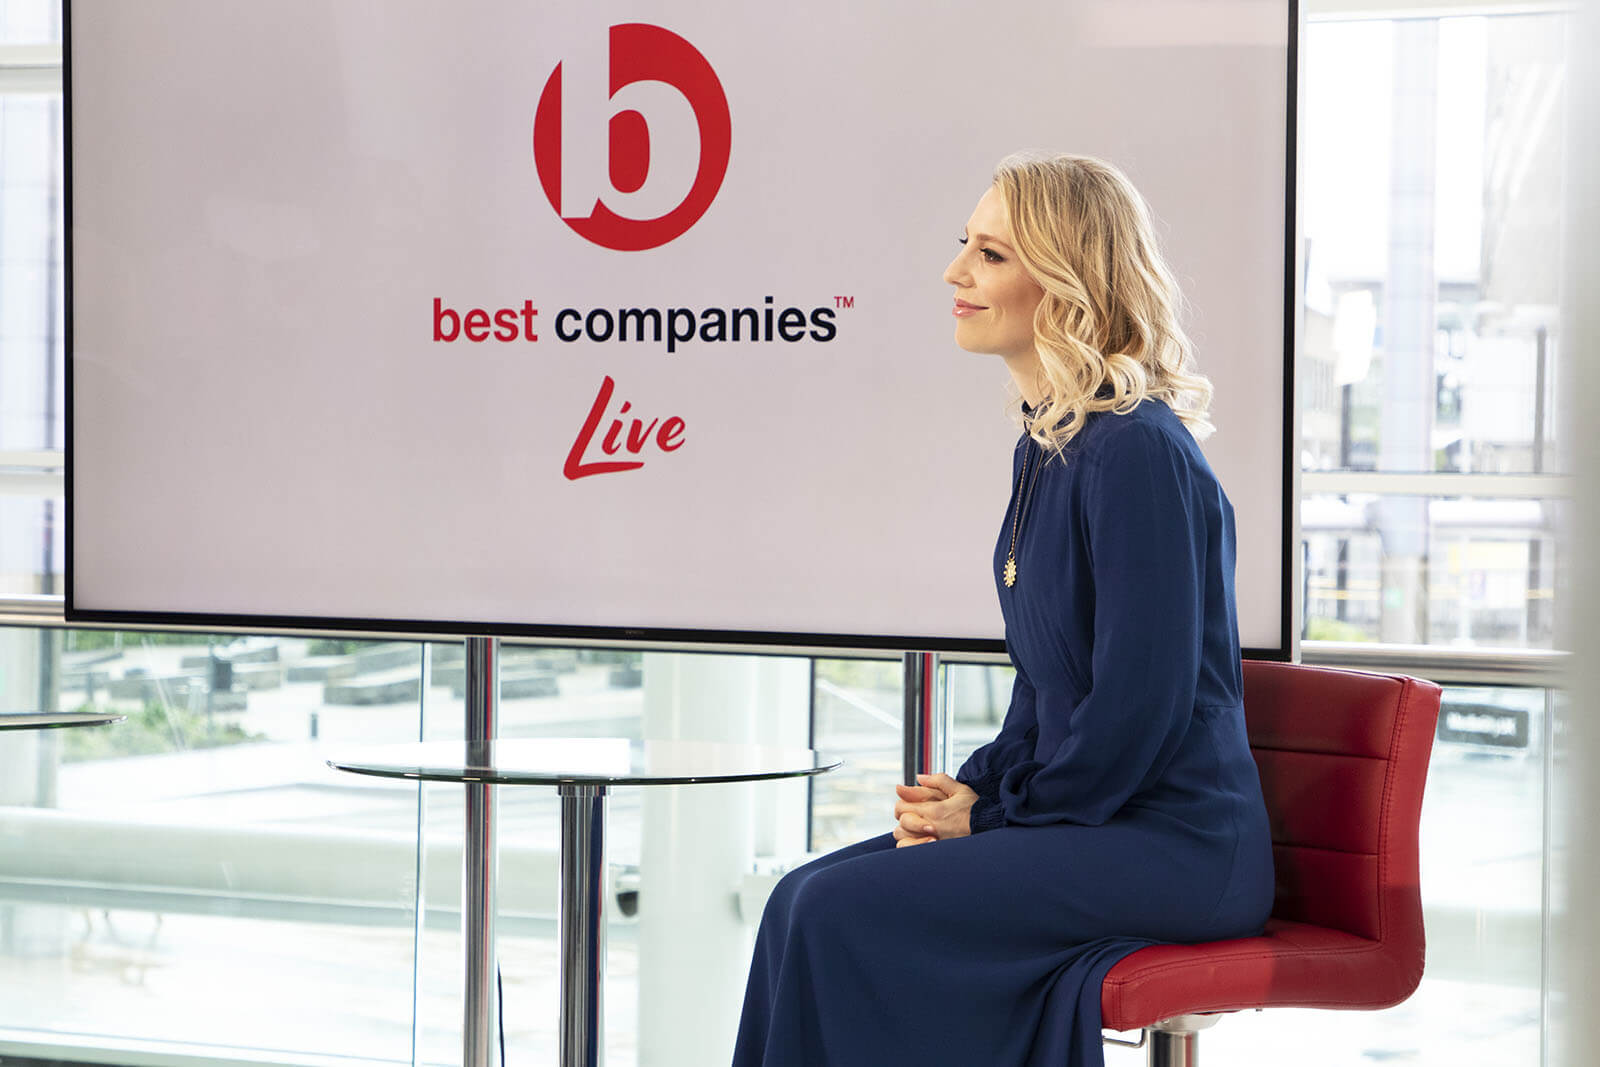 Jemma Bolt on the set of Best Companies Live at Media City UK